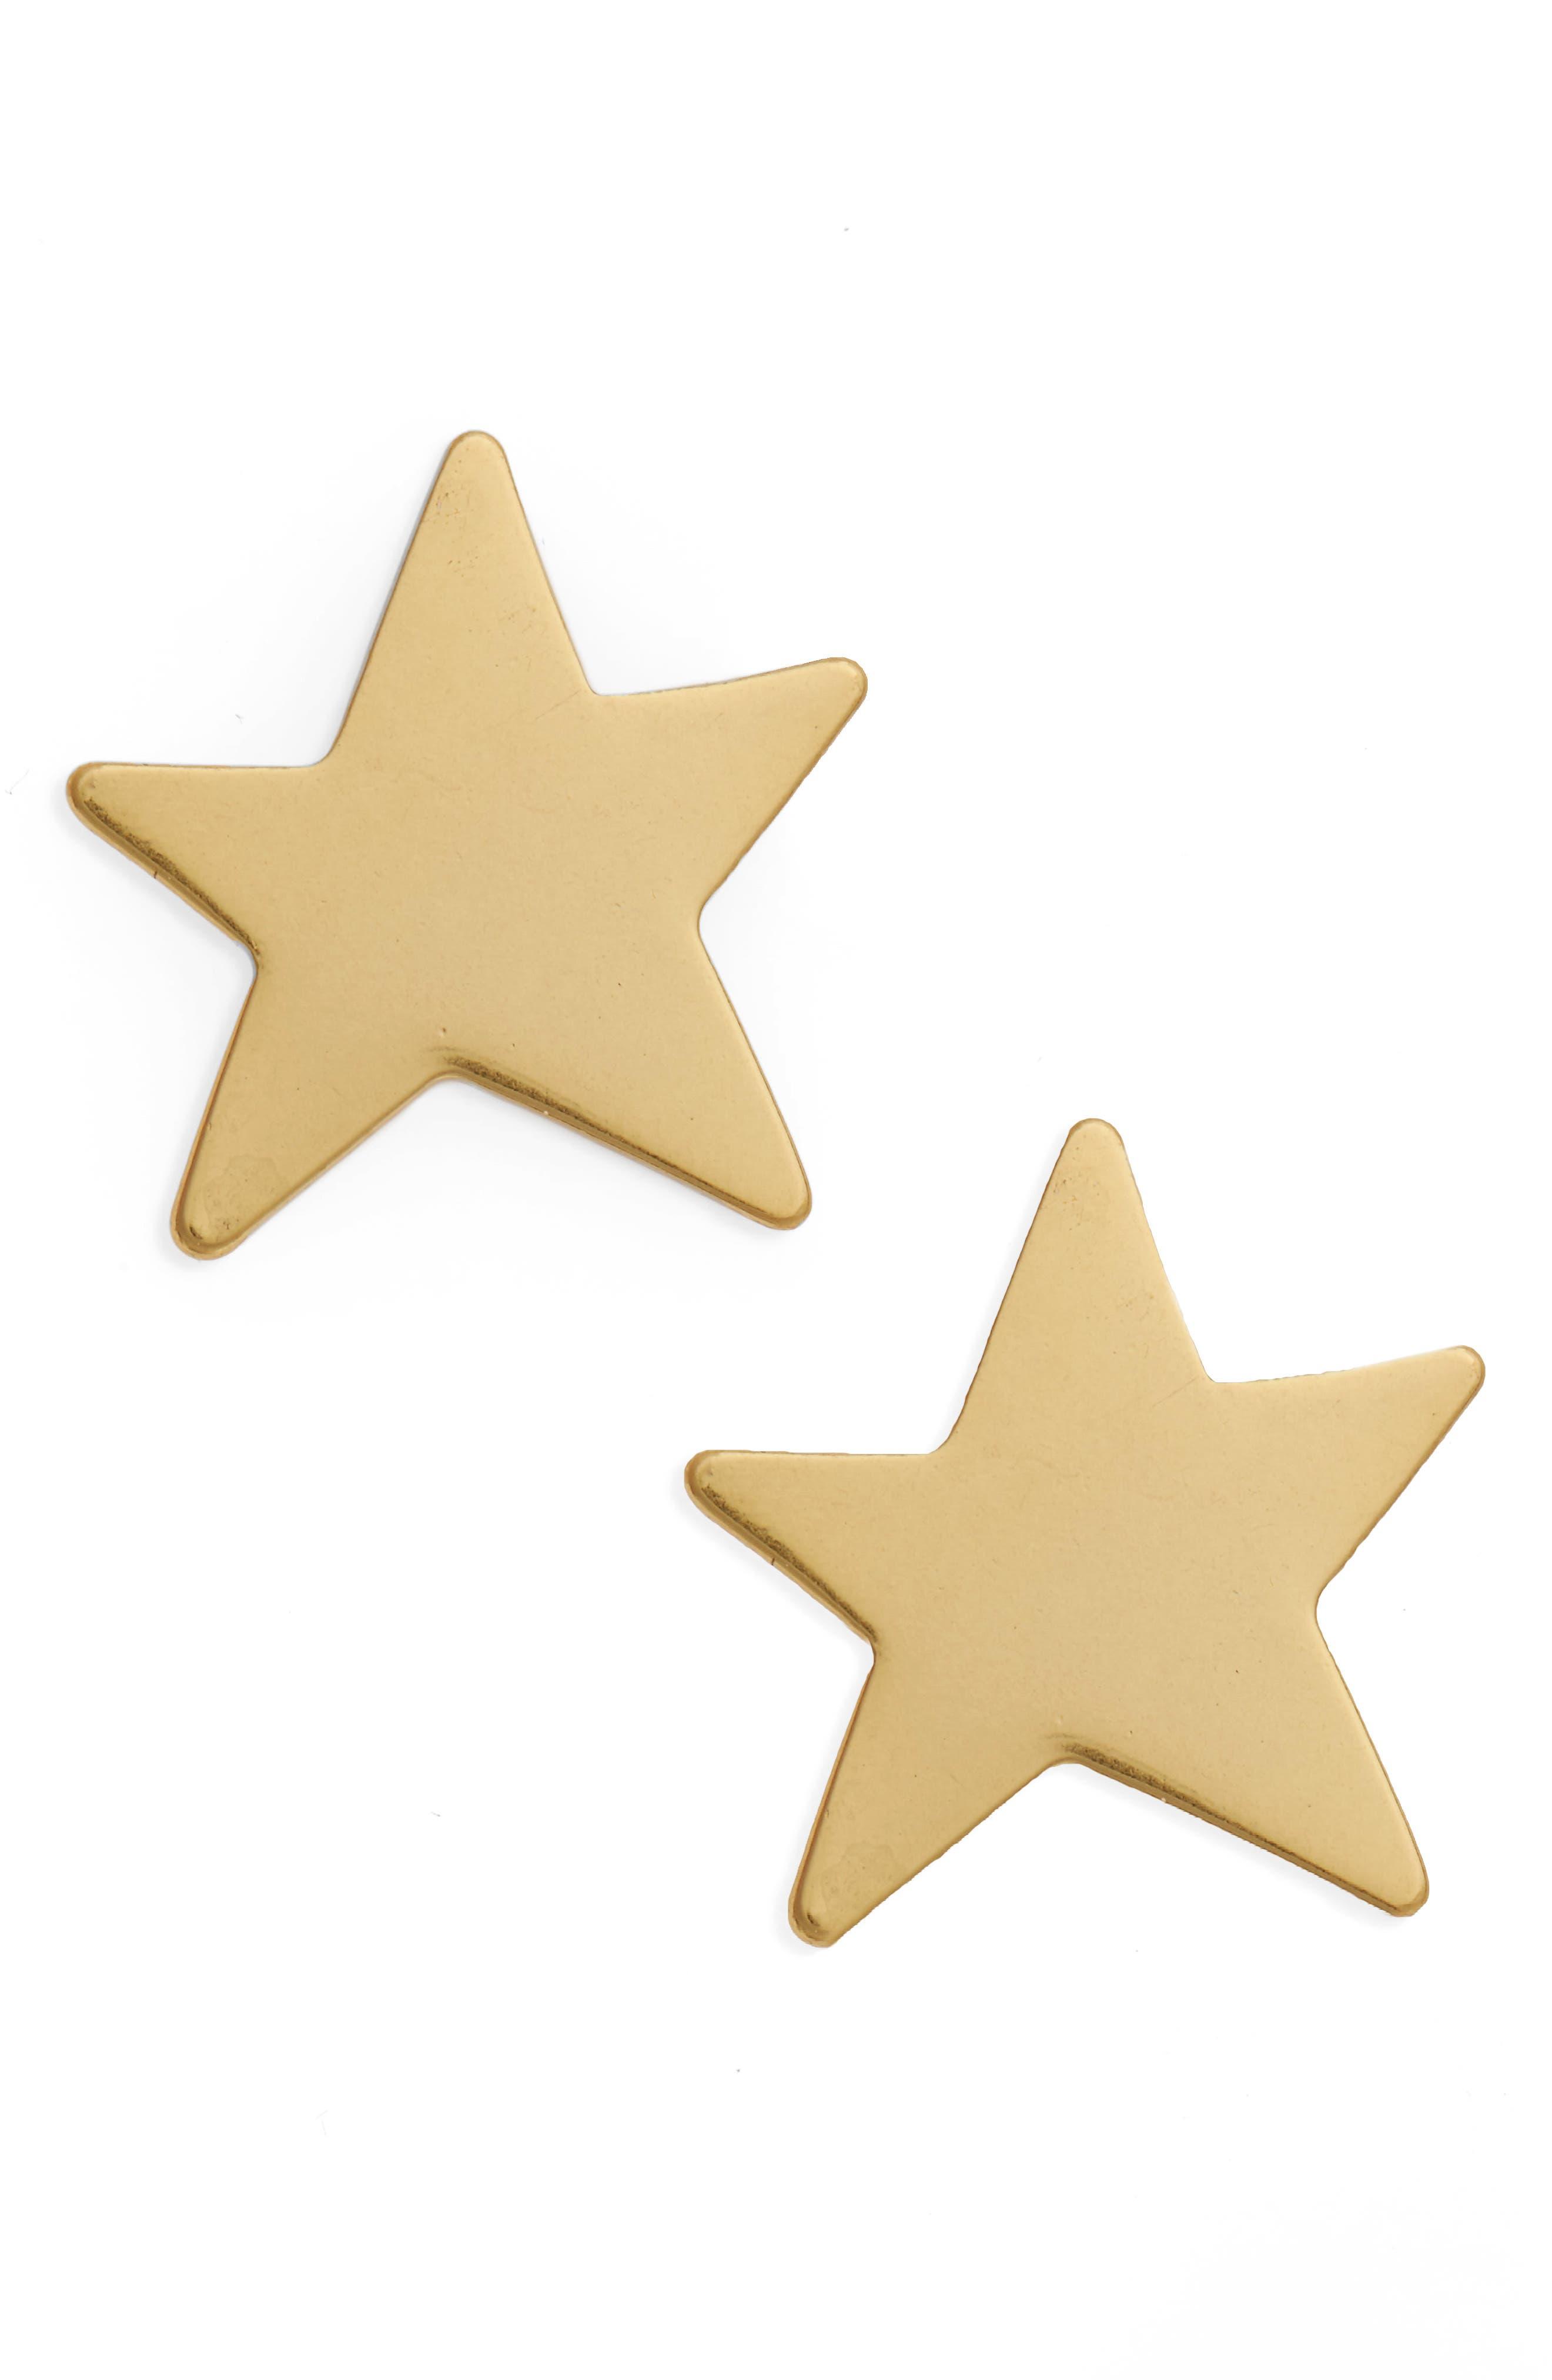 Star Earrings,                             Main thumbnail 1, color,                             710